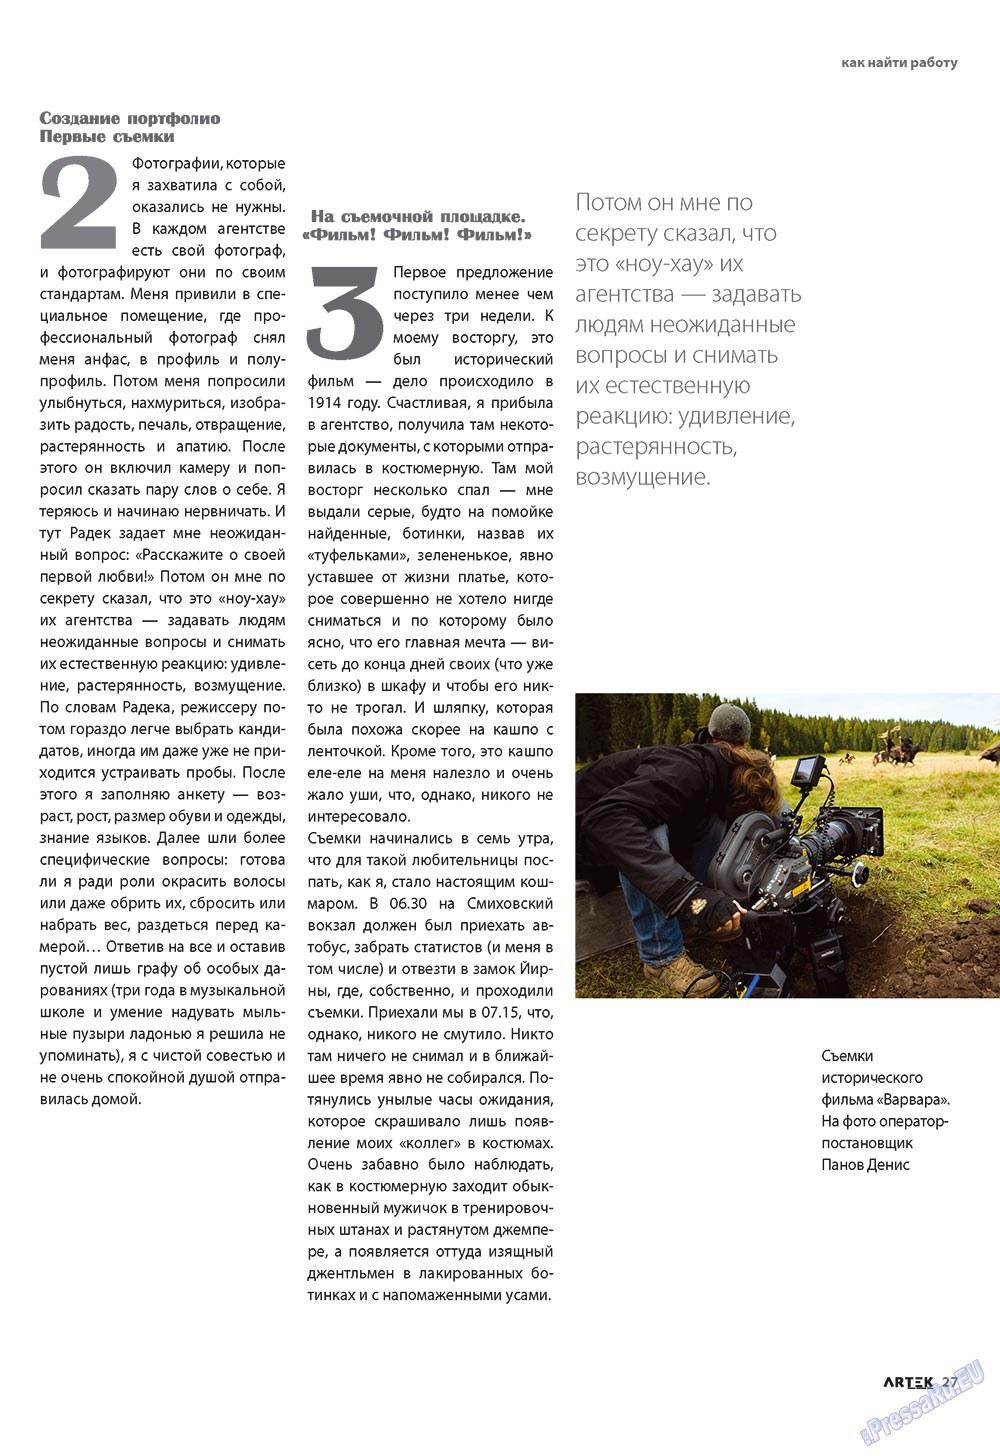 Артек (журнал). 2009 год, номер 4, стр. 27